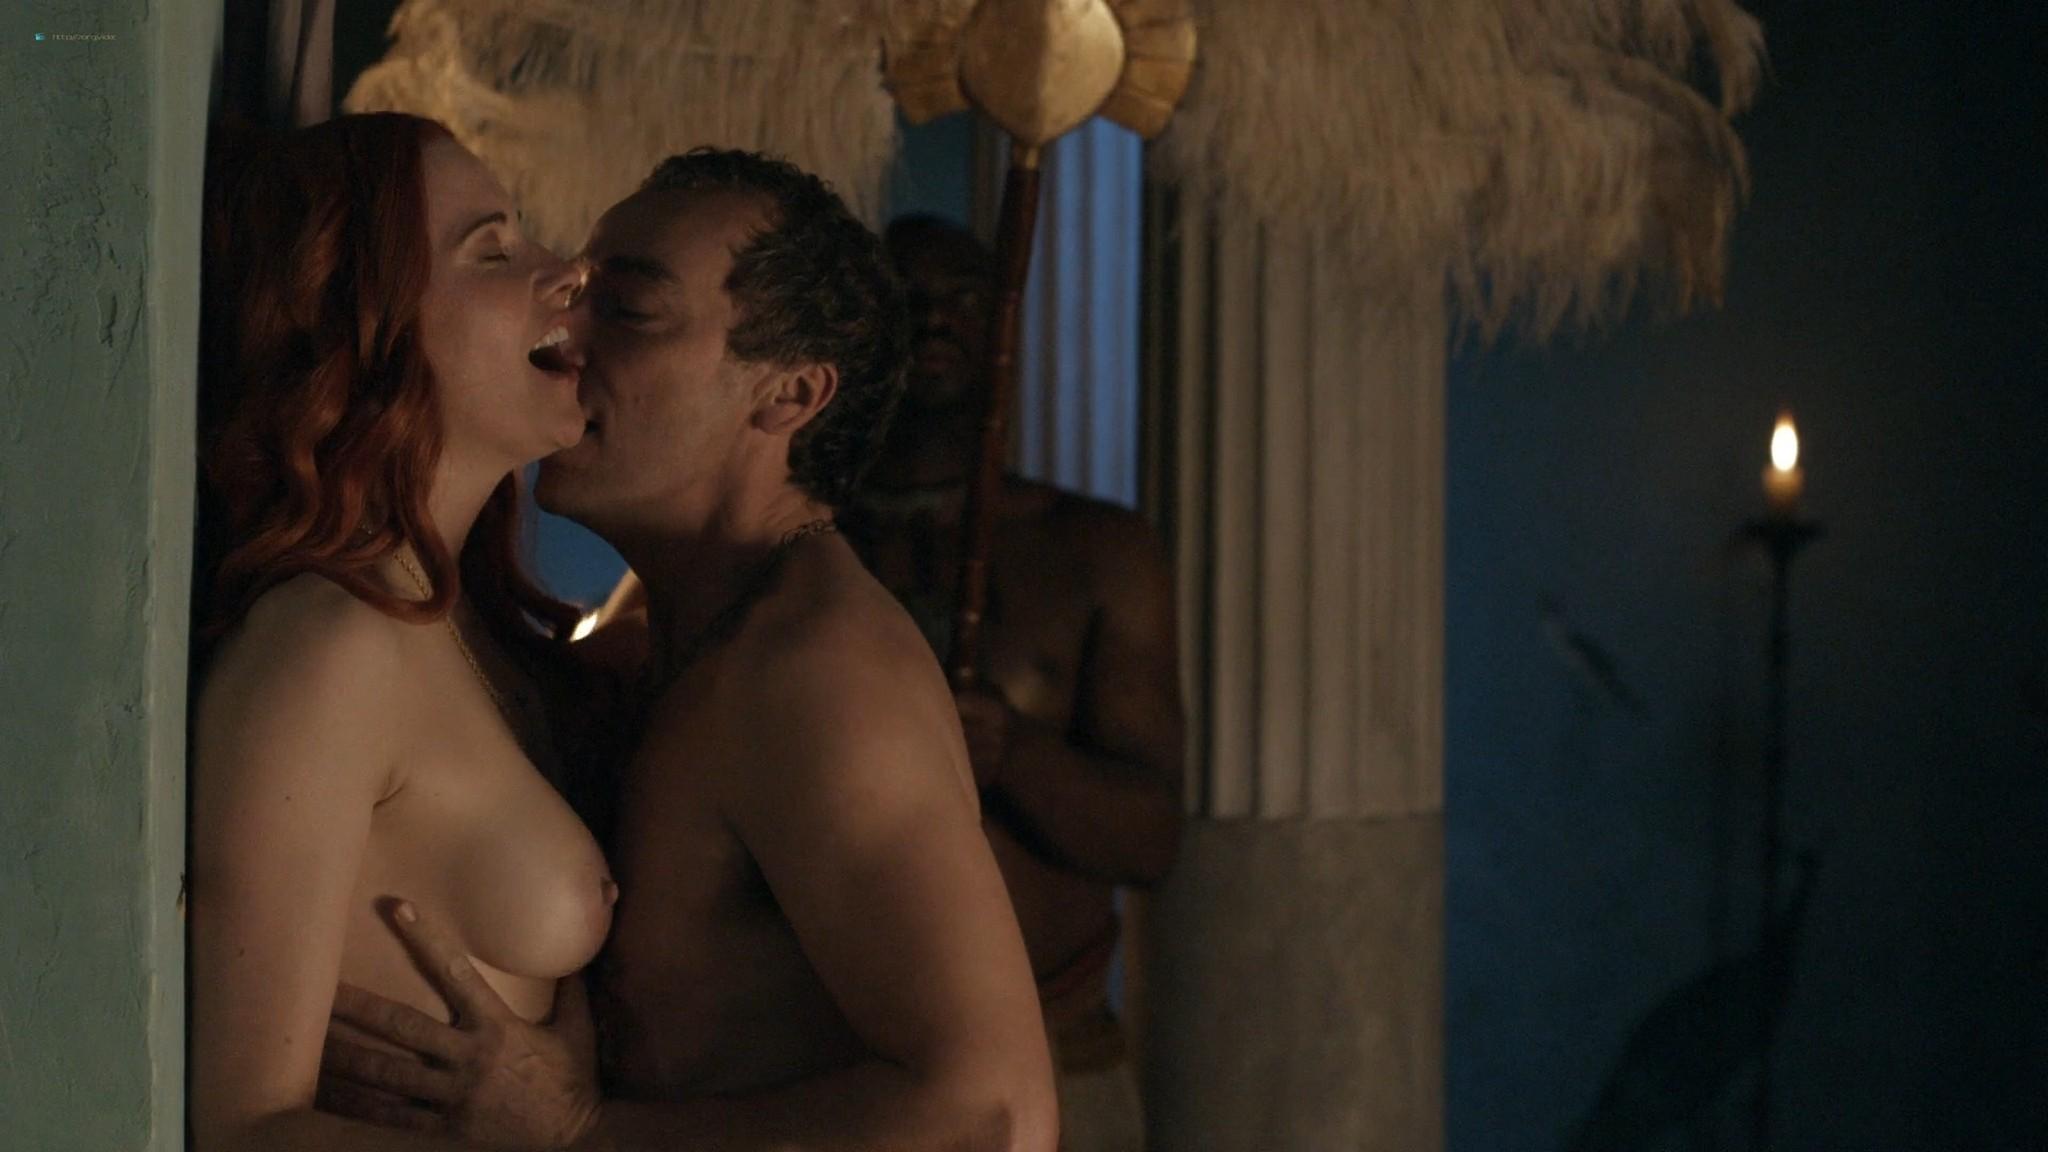 Lucy Lawless nude sex Erin Cummings, Aria Dickson nude too - Spartacus - Sacramentum Gladiatorum (2010) s1e2 HD 1080p (3)